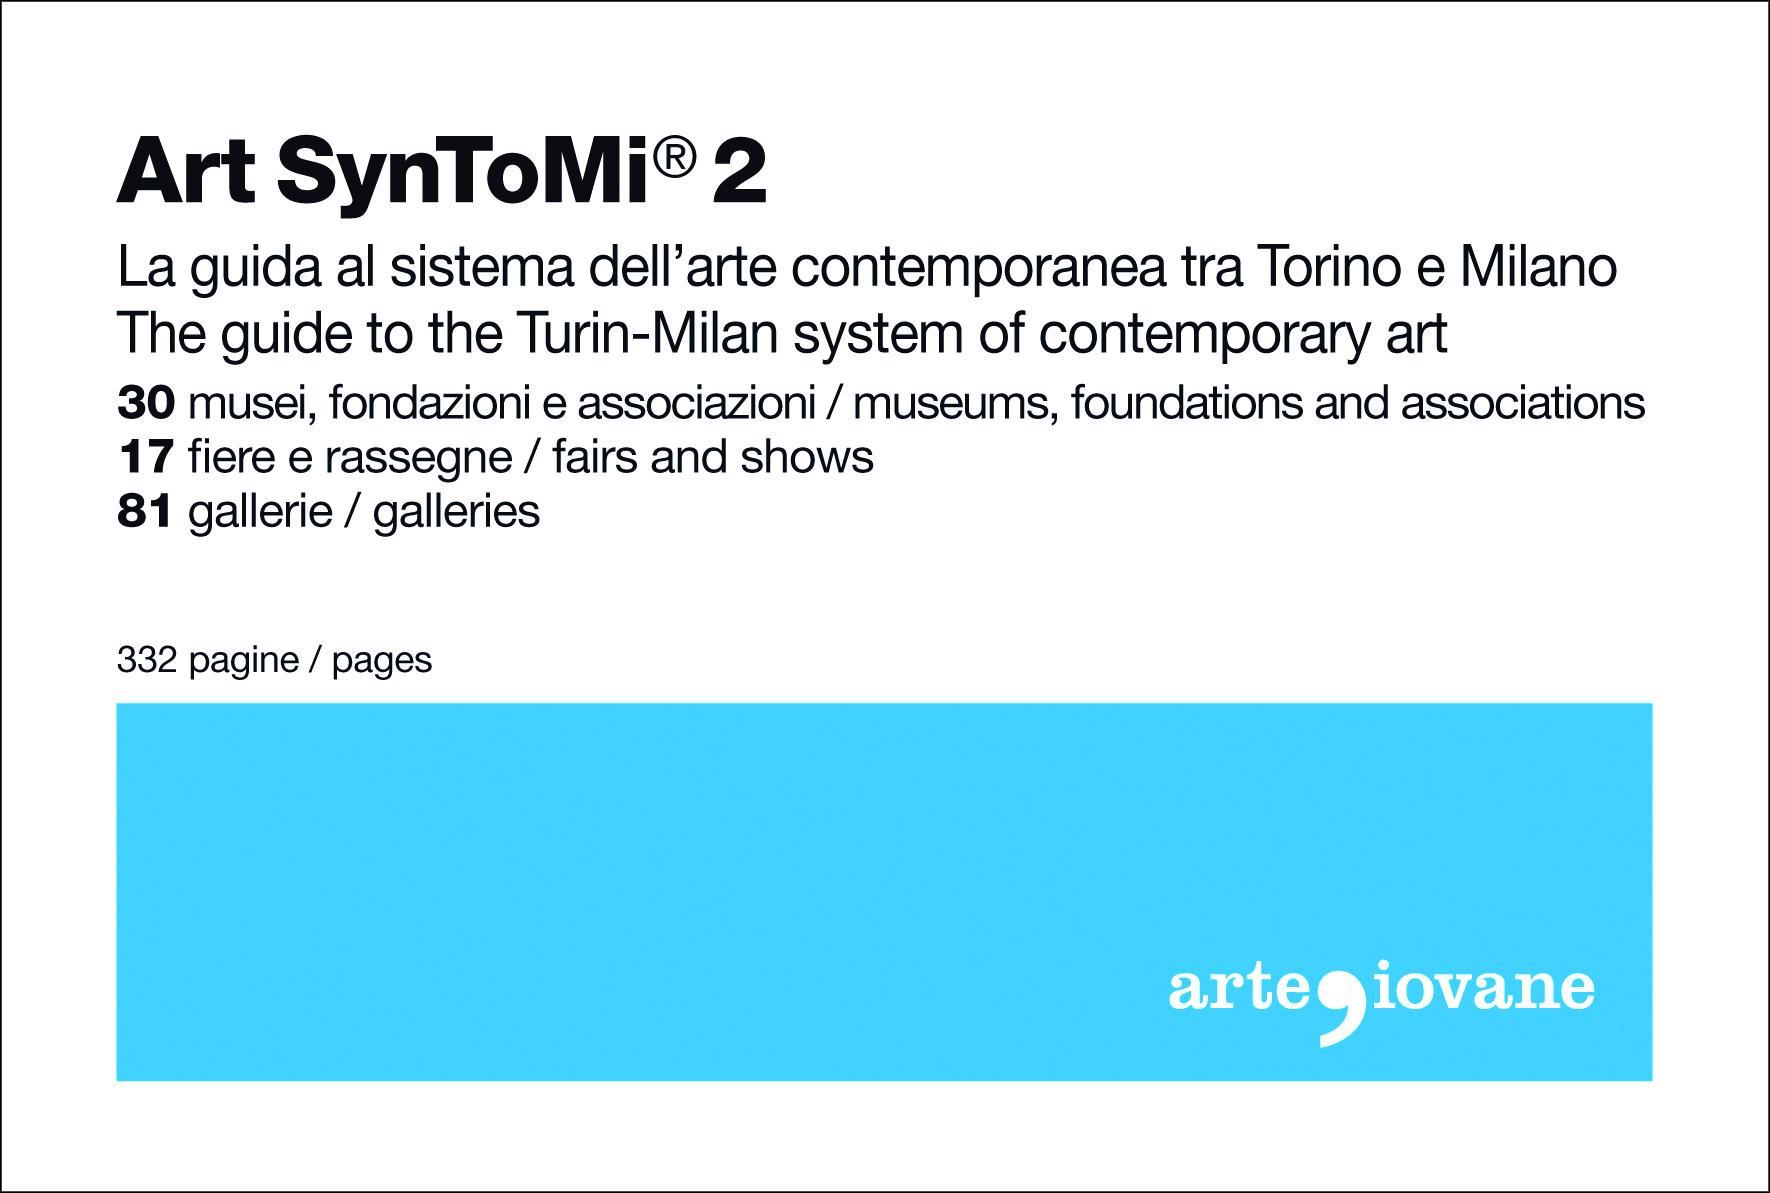 Art SynToMi 2